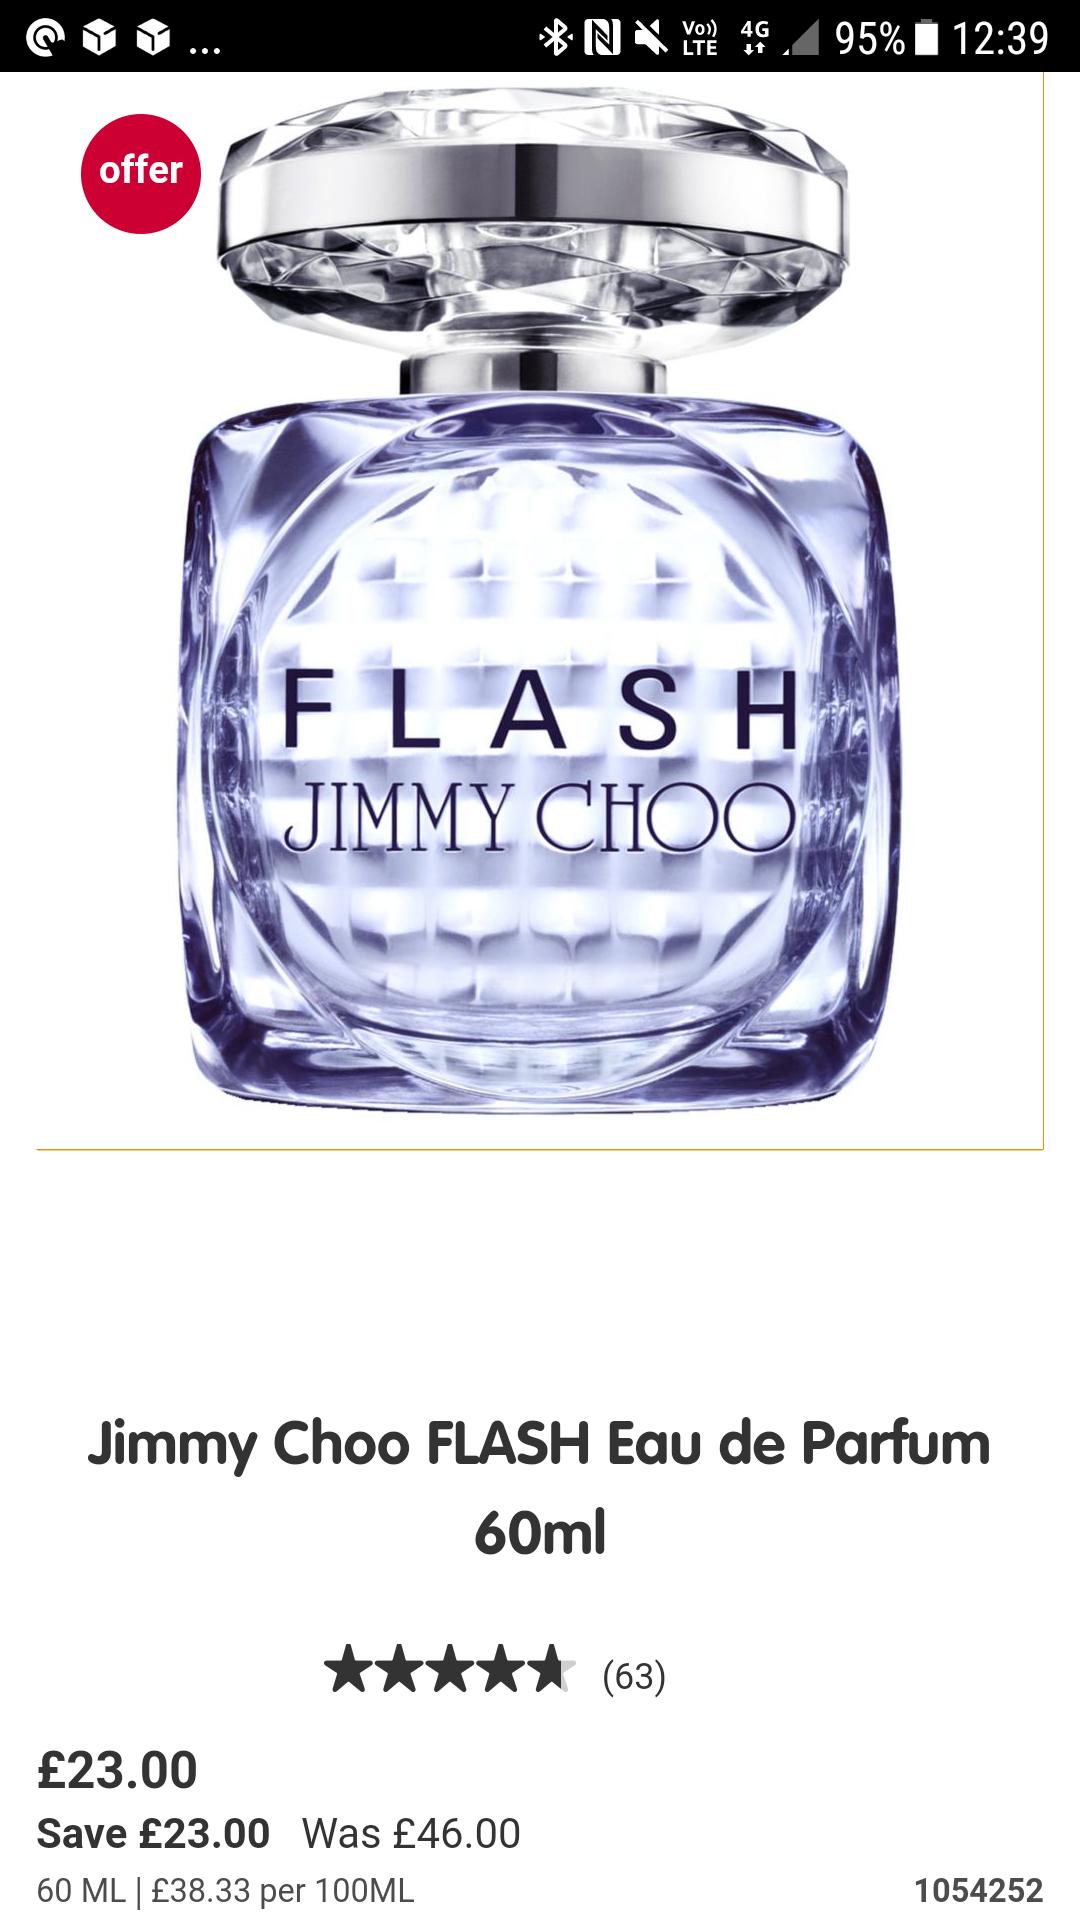 Jimmy Choo Flash Perfume 60ml £23 @ Boots